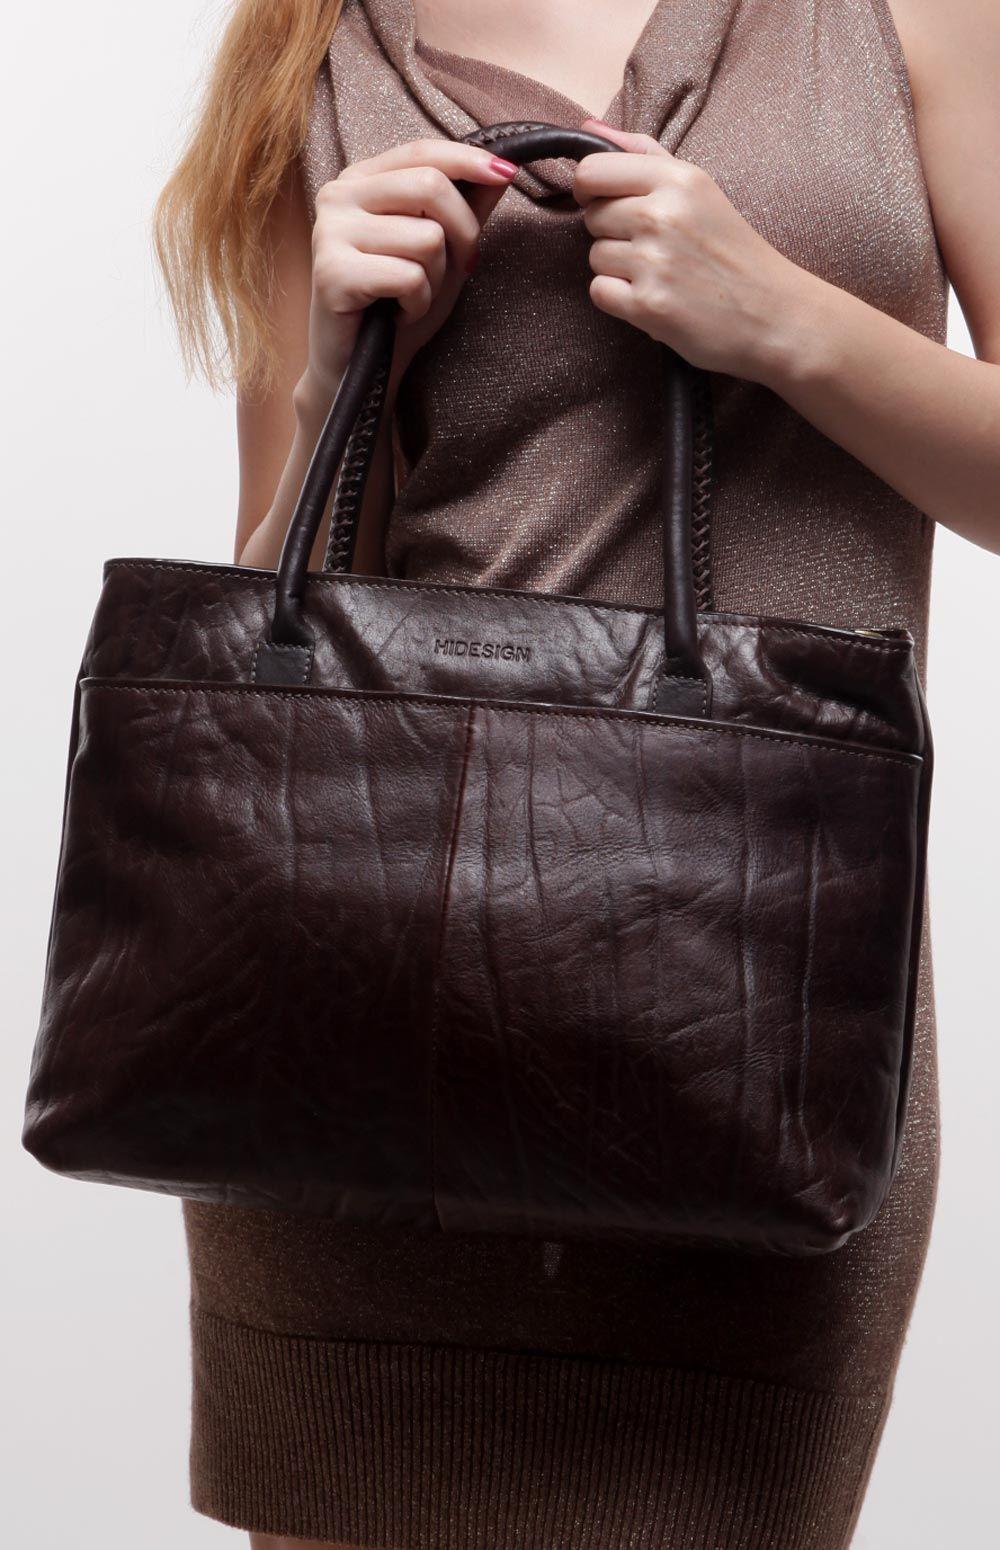 Hidesign Women Girls Handbags Yangtze 02 Ele Ranch Brown   The Big ... 4d93a37814